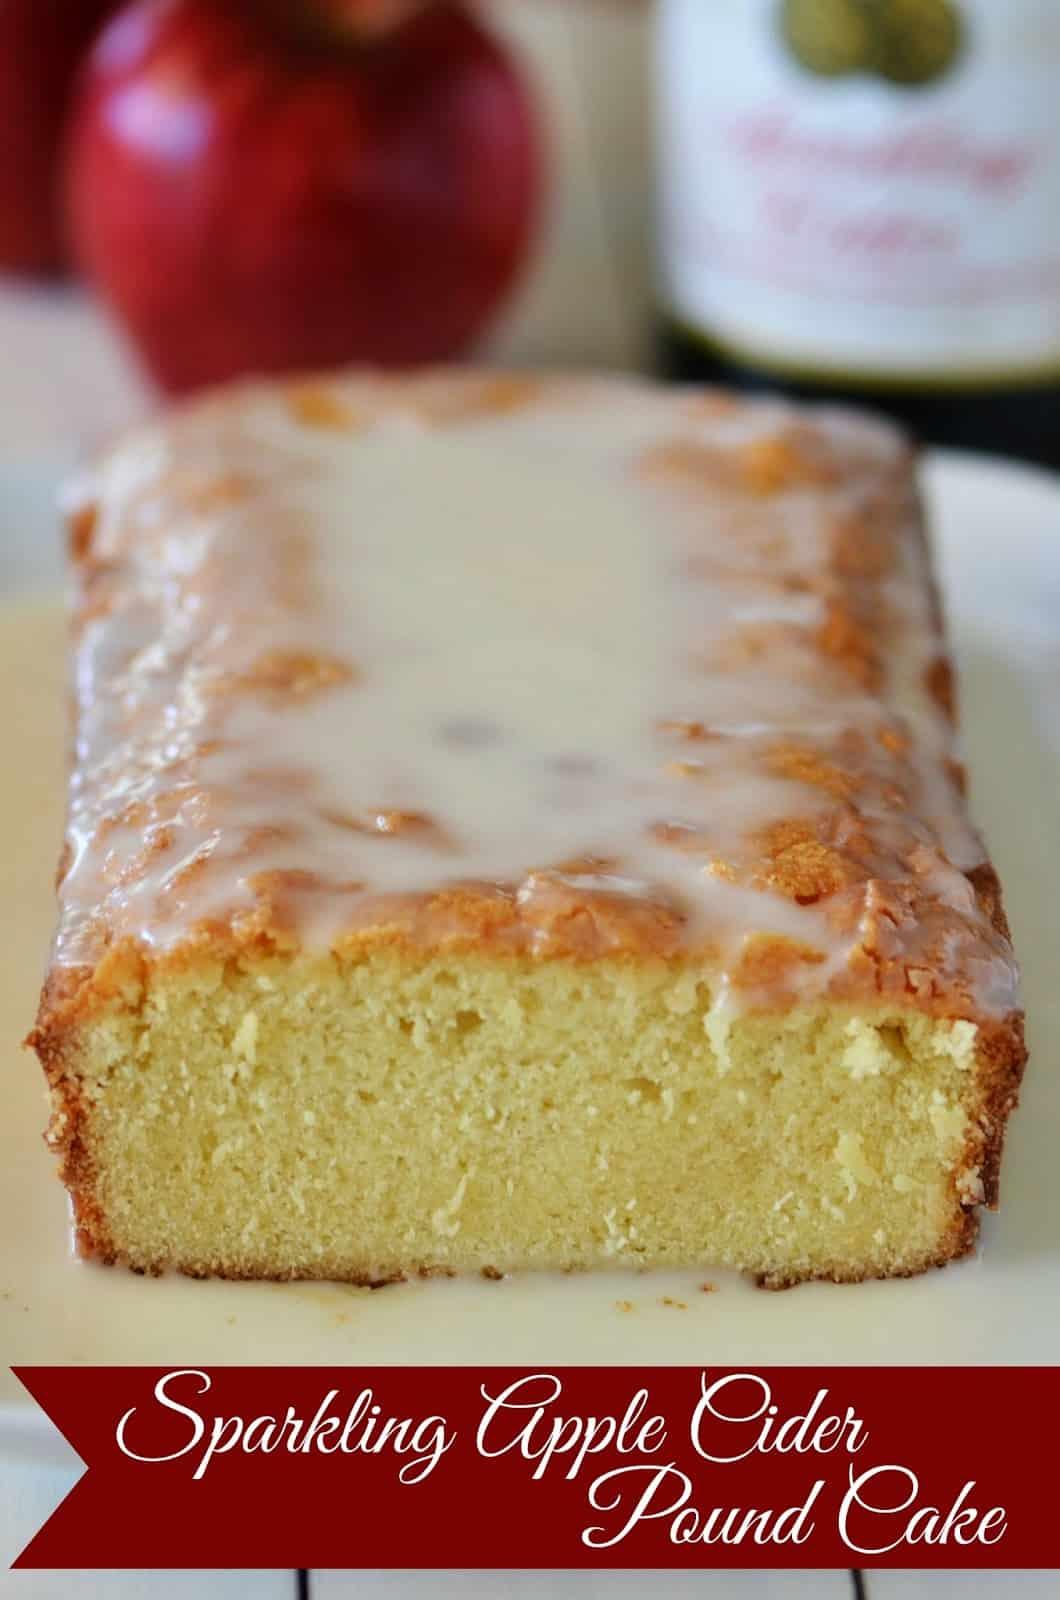 Apple Sparkling Cider Pound Cake